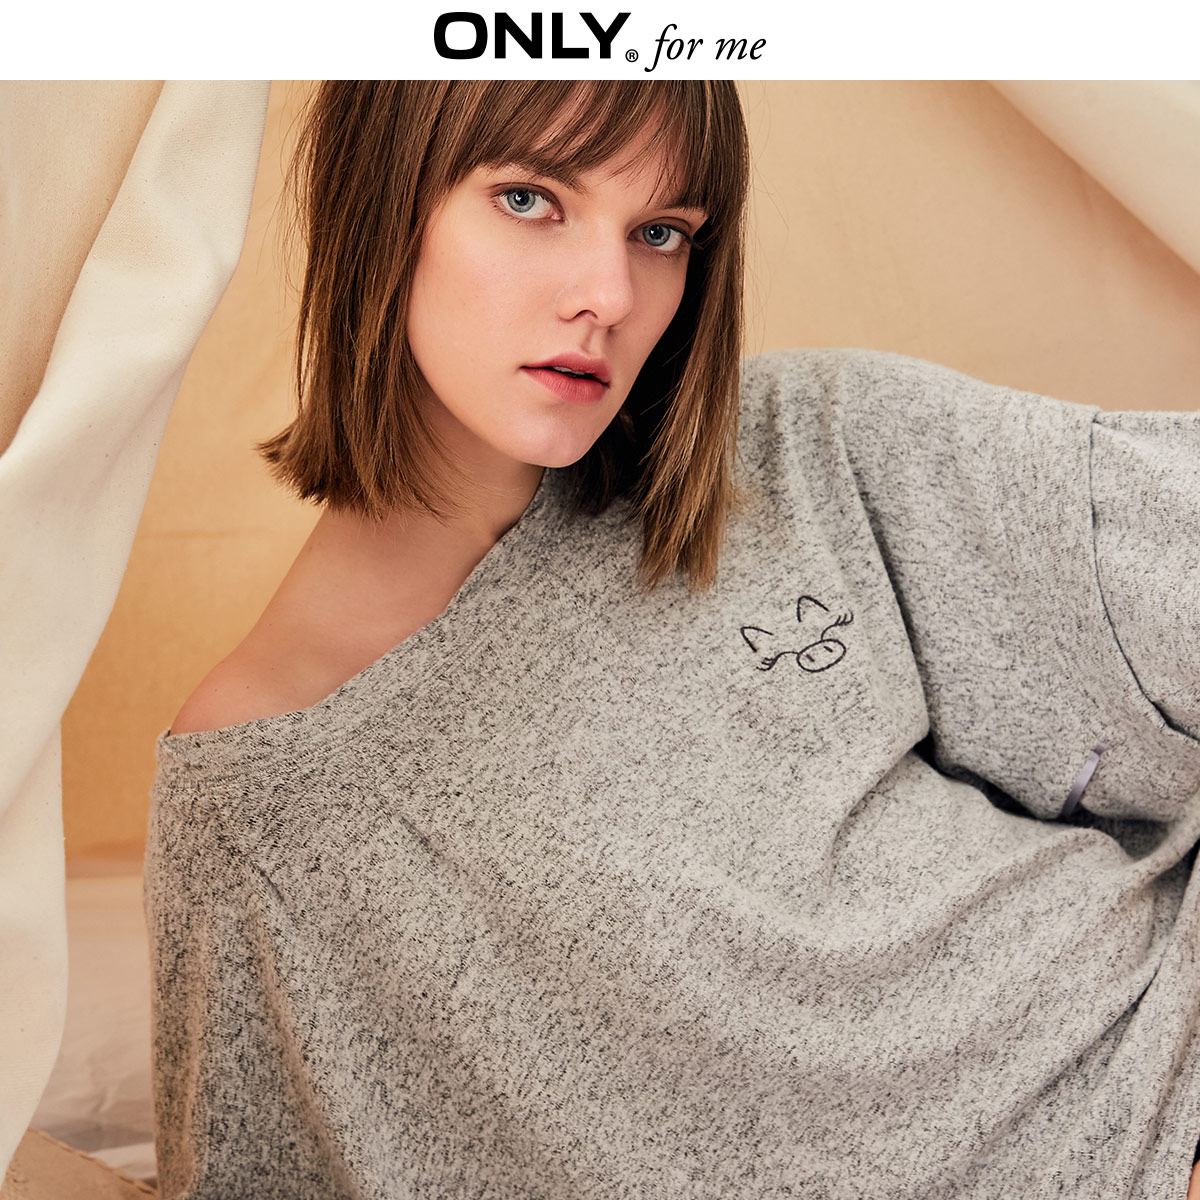 ONLY Women's Spring Loose Fit Pullover Sleepwear Sweatshirt | 11919S603